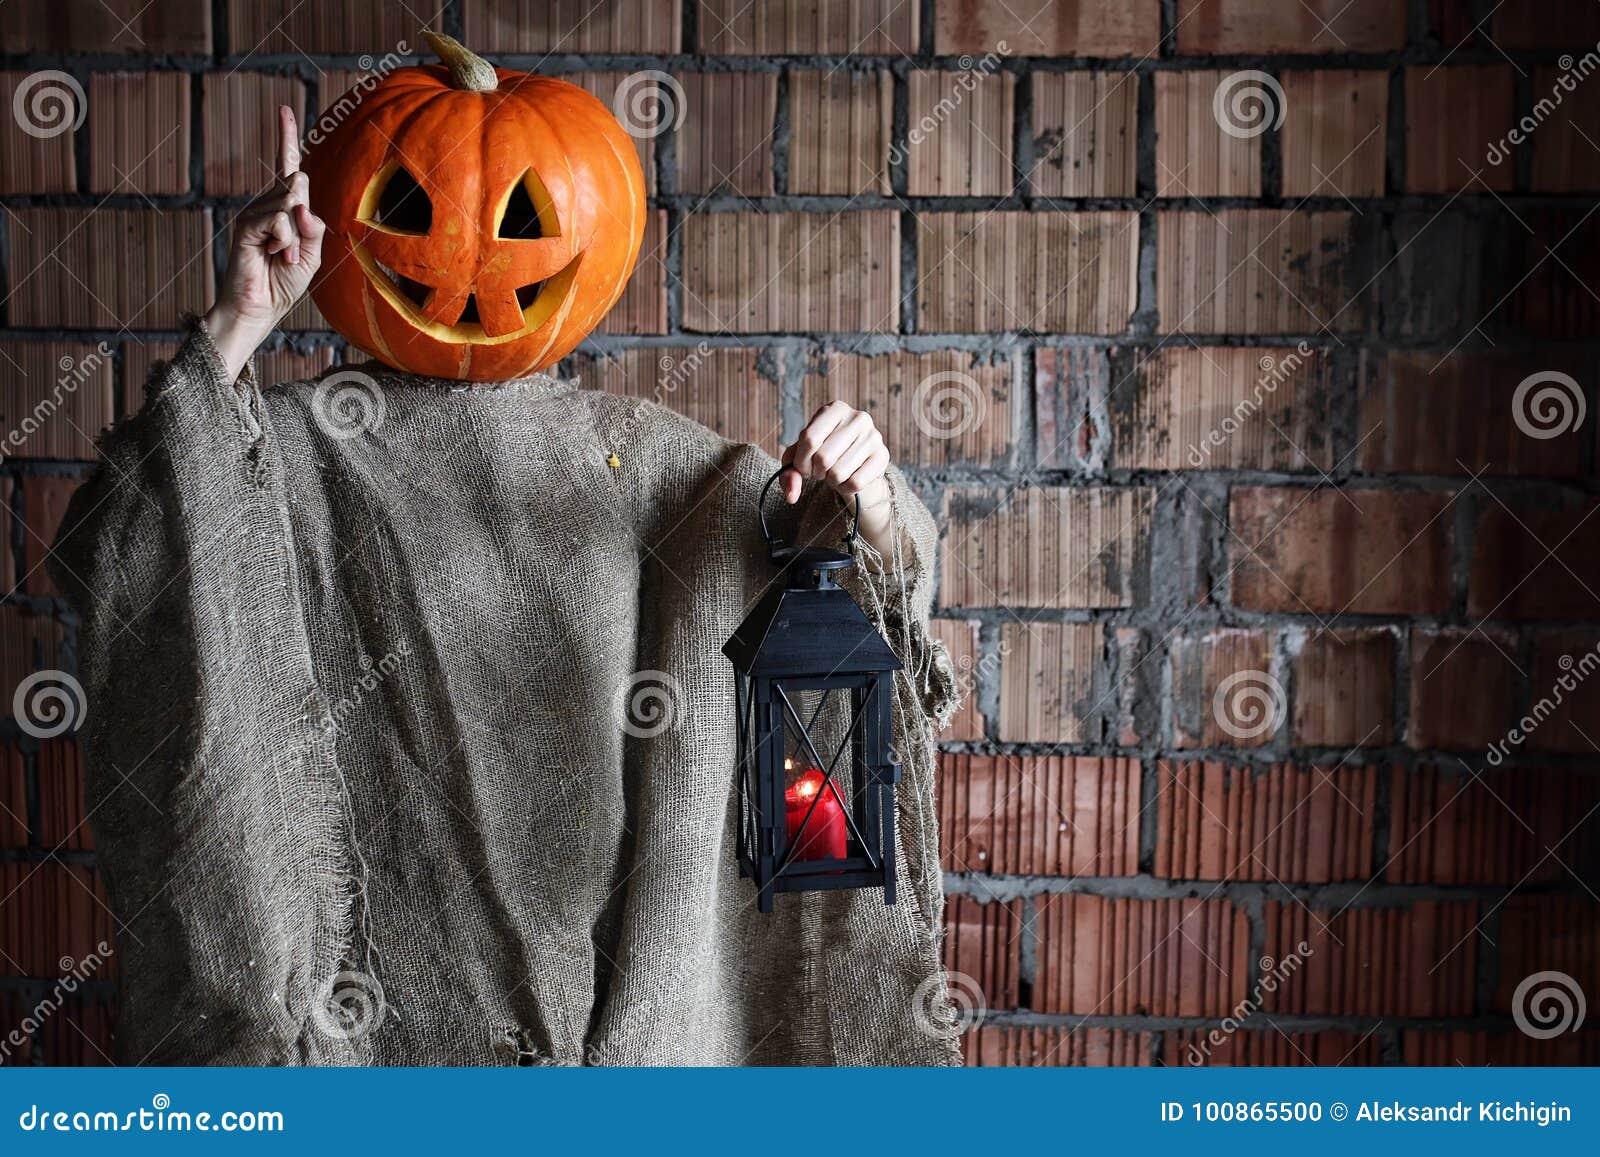 pumpkin head monster sign hand space halloween stock photo - image